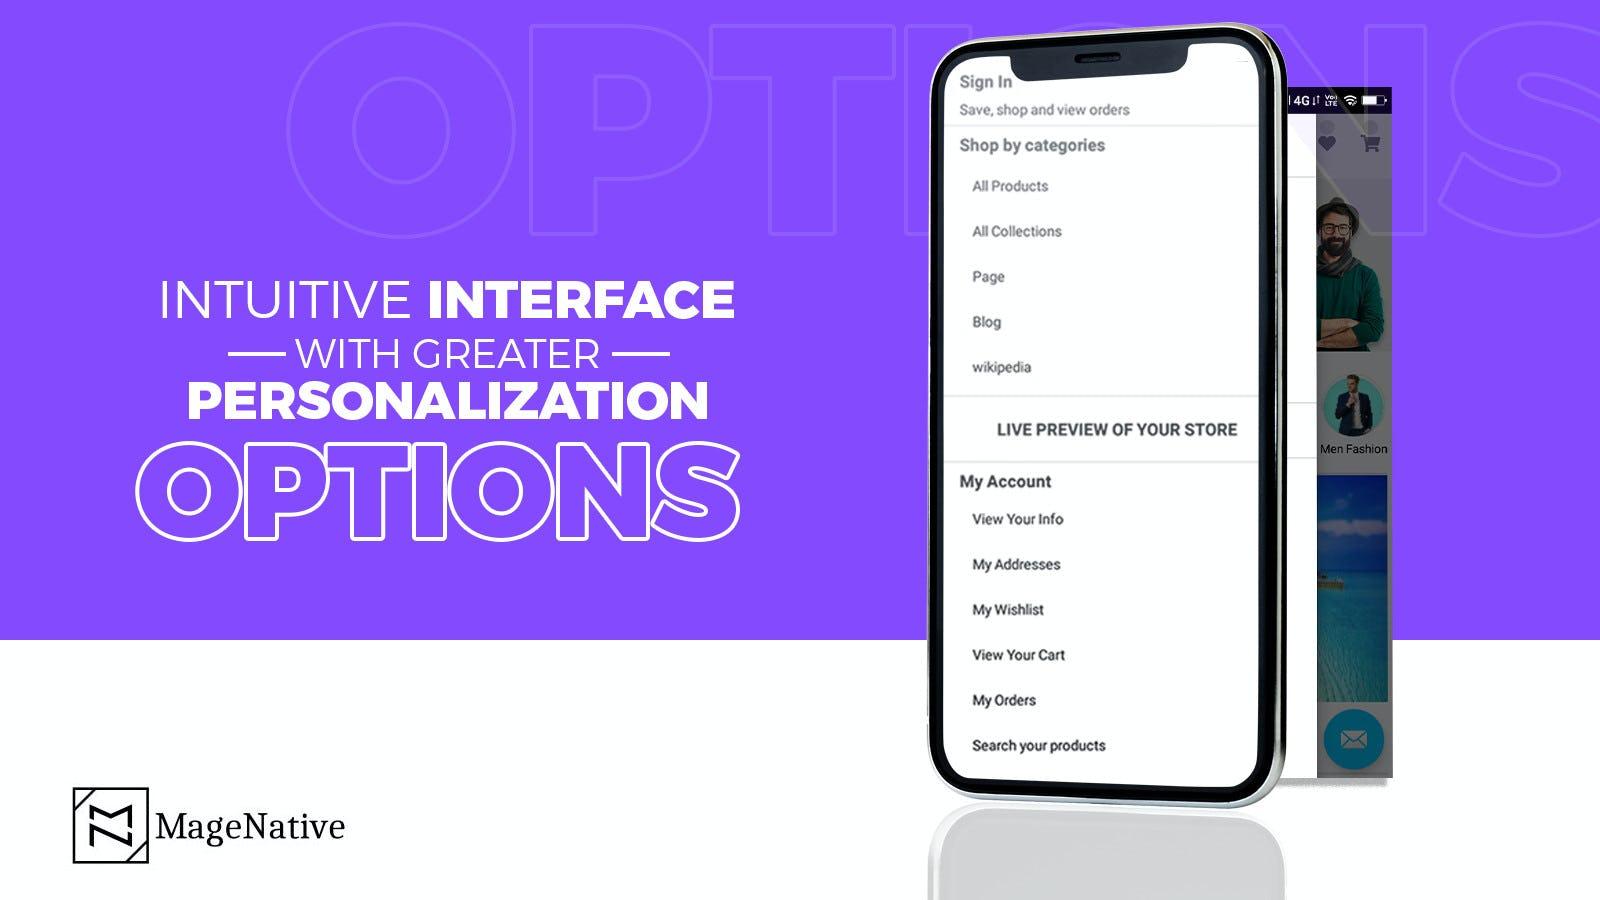 MageNative Shopify Mobile App Software - 5